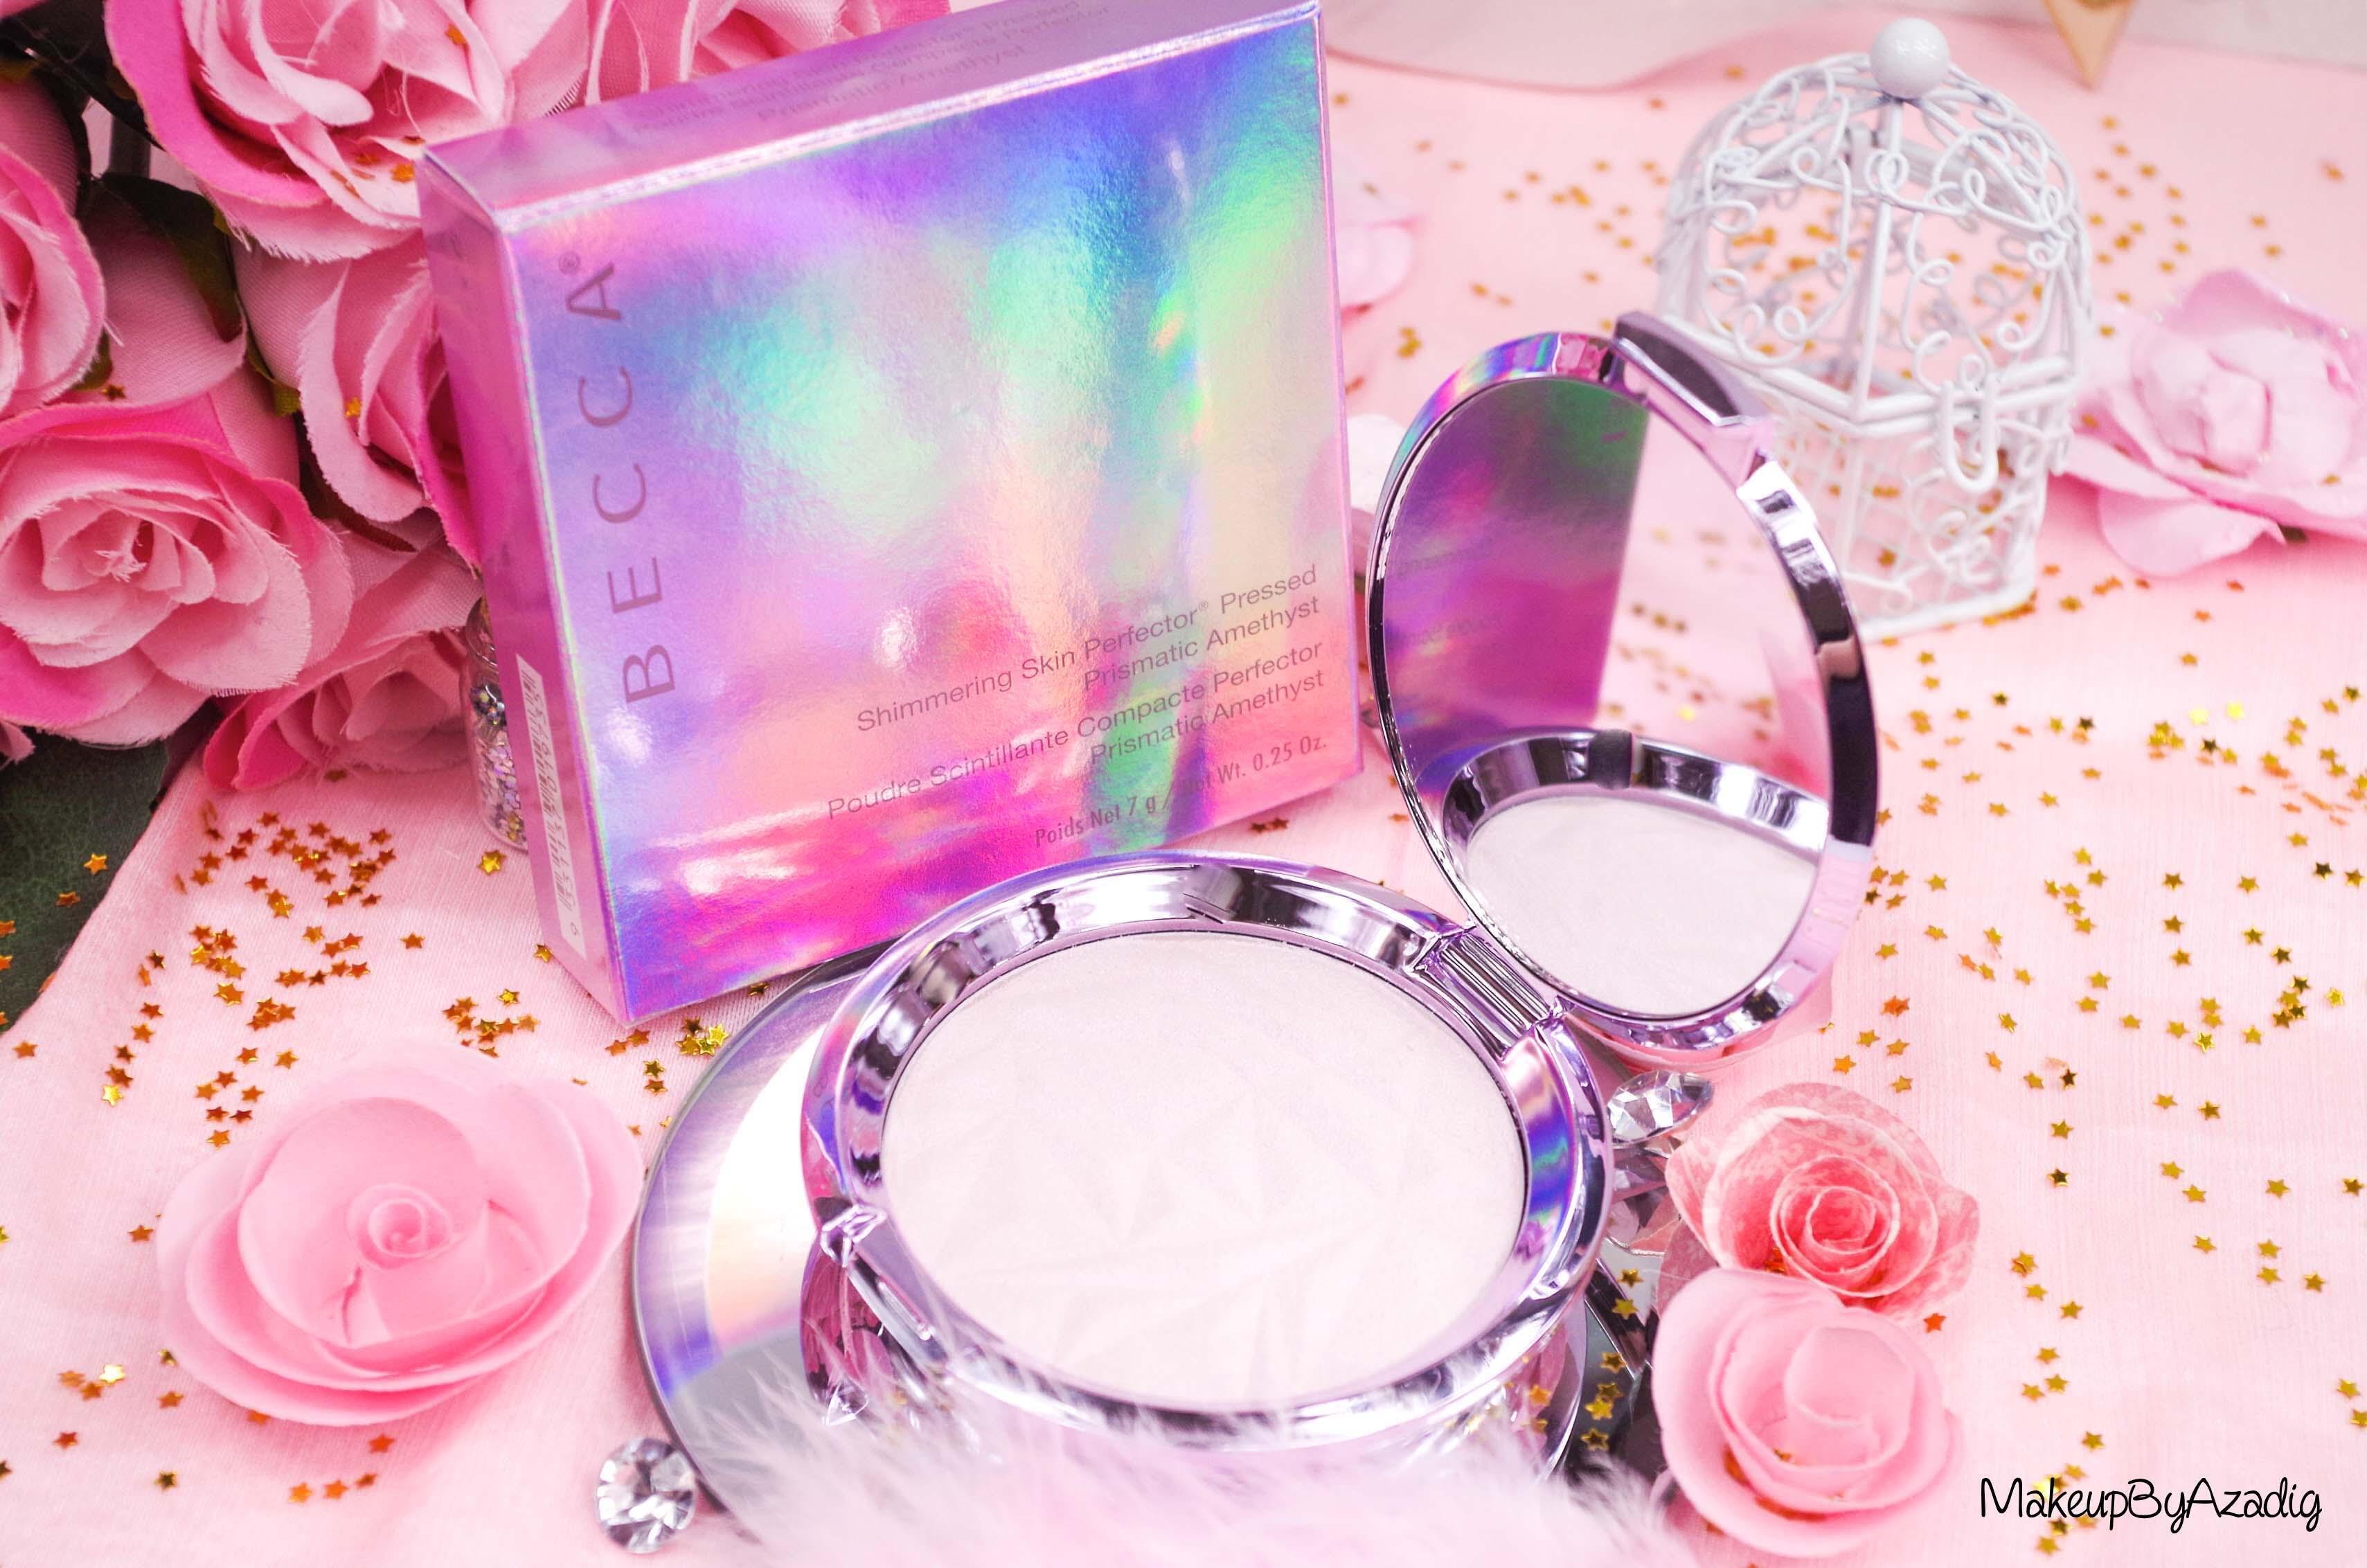 revue-shimmering-skin-perfector-pressed-highlighter-enlumineur-violet-prismatic-amethyst-avis-swatch-prix-makeupbyazadig-miniature-2